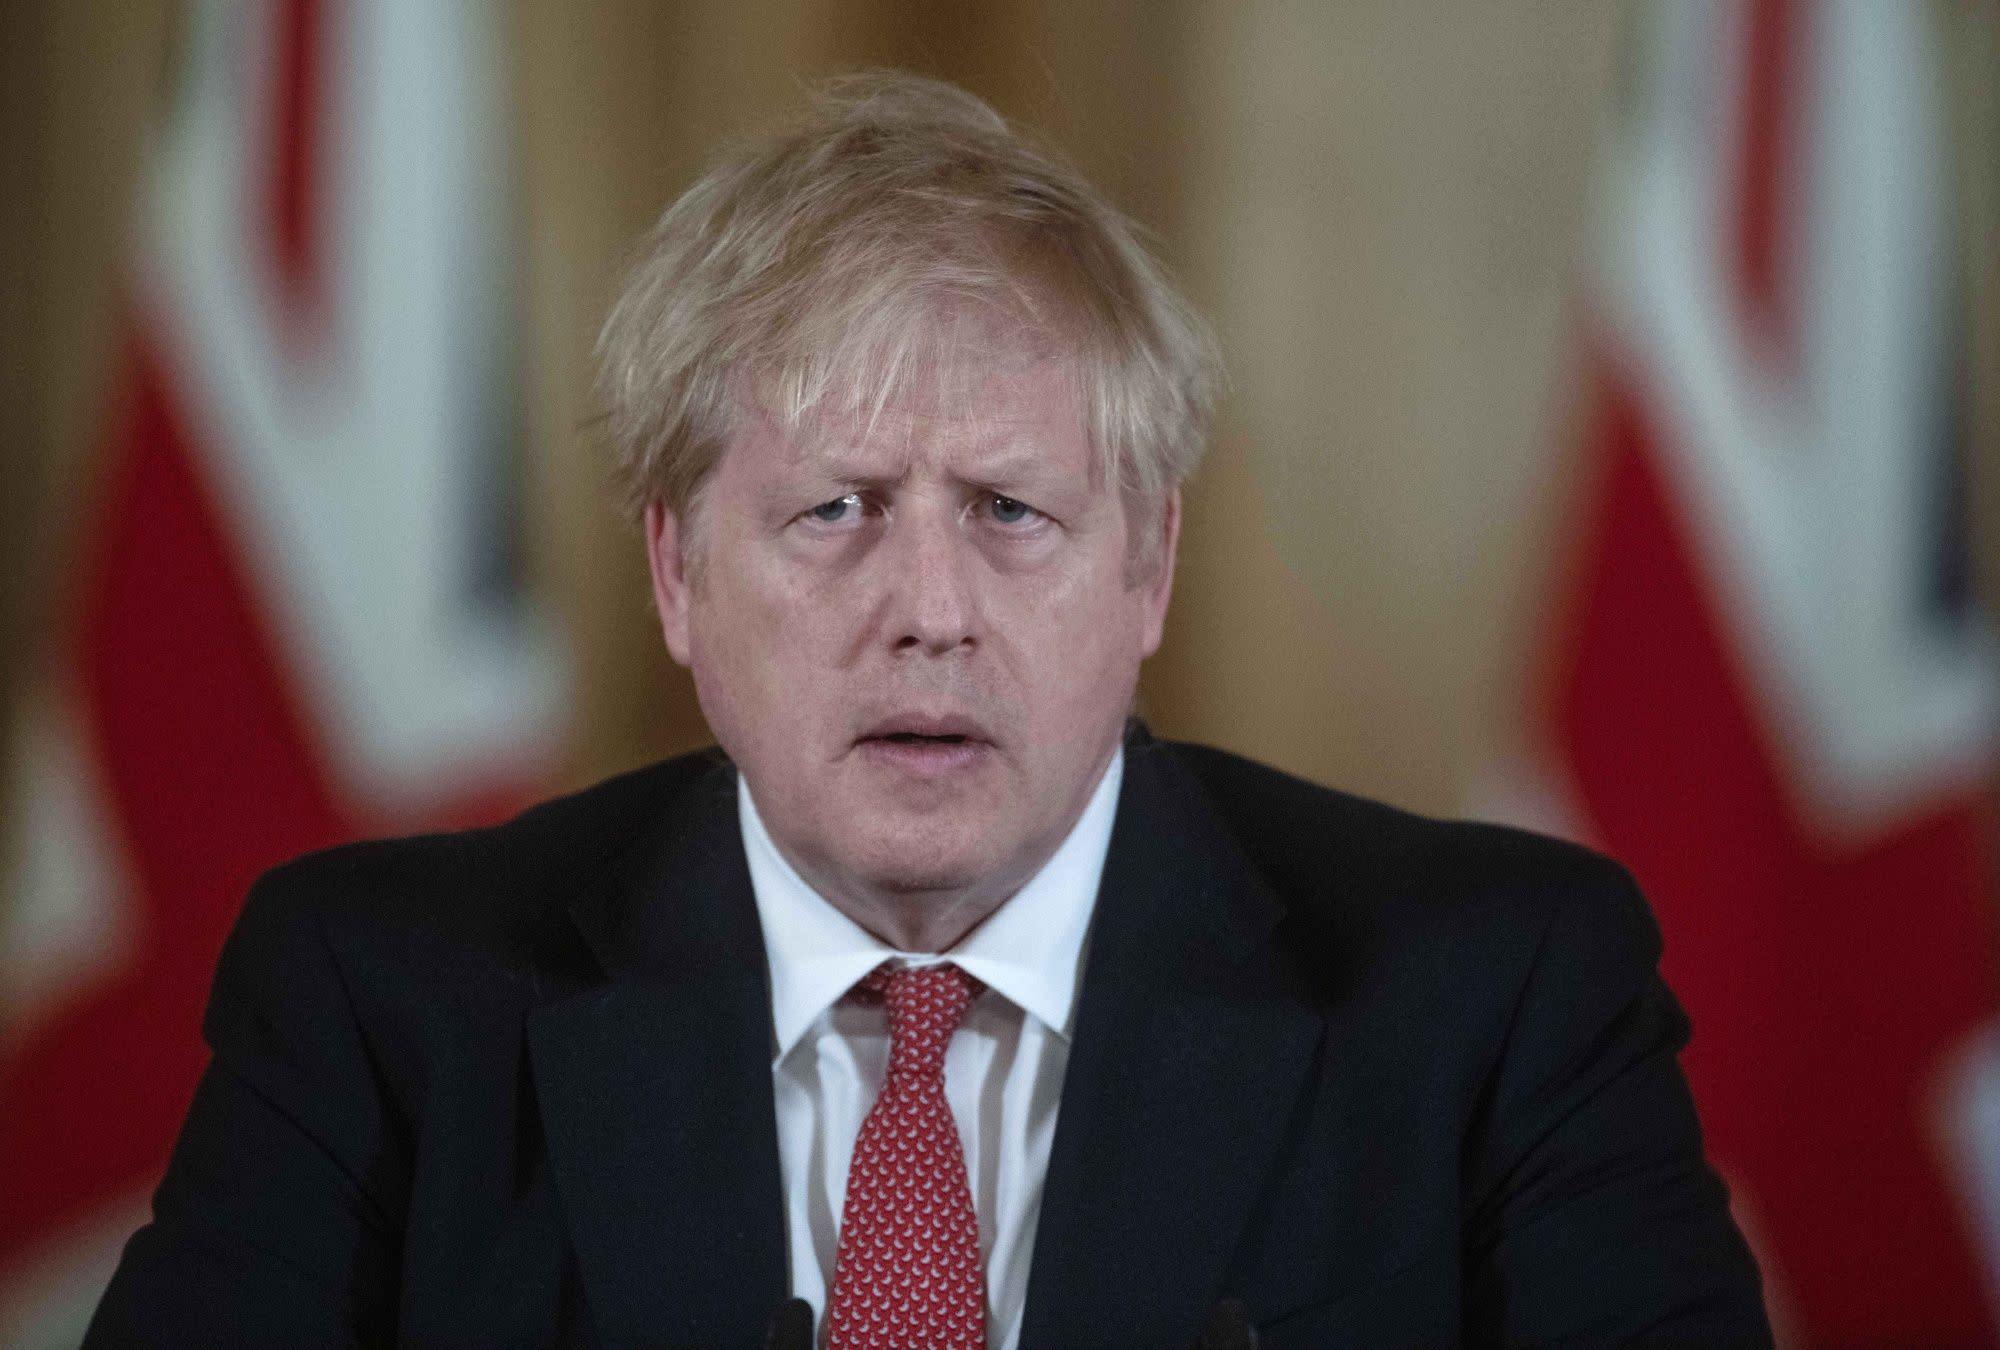 British PM Boris Johnson in intensive care as coronavirus symptoms worsen